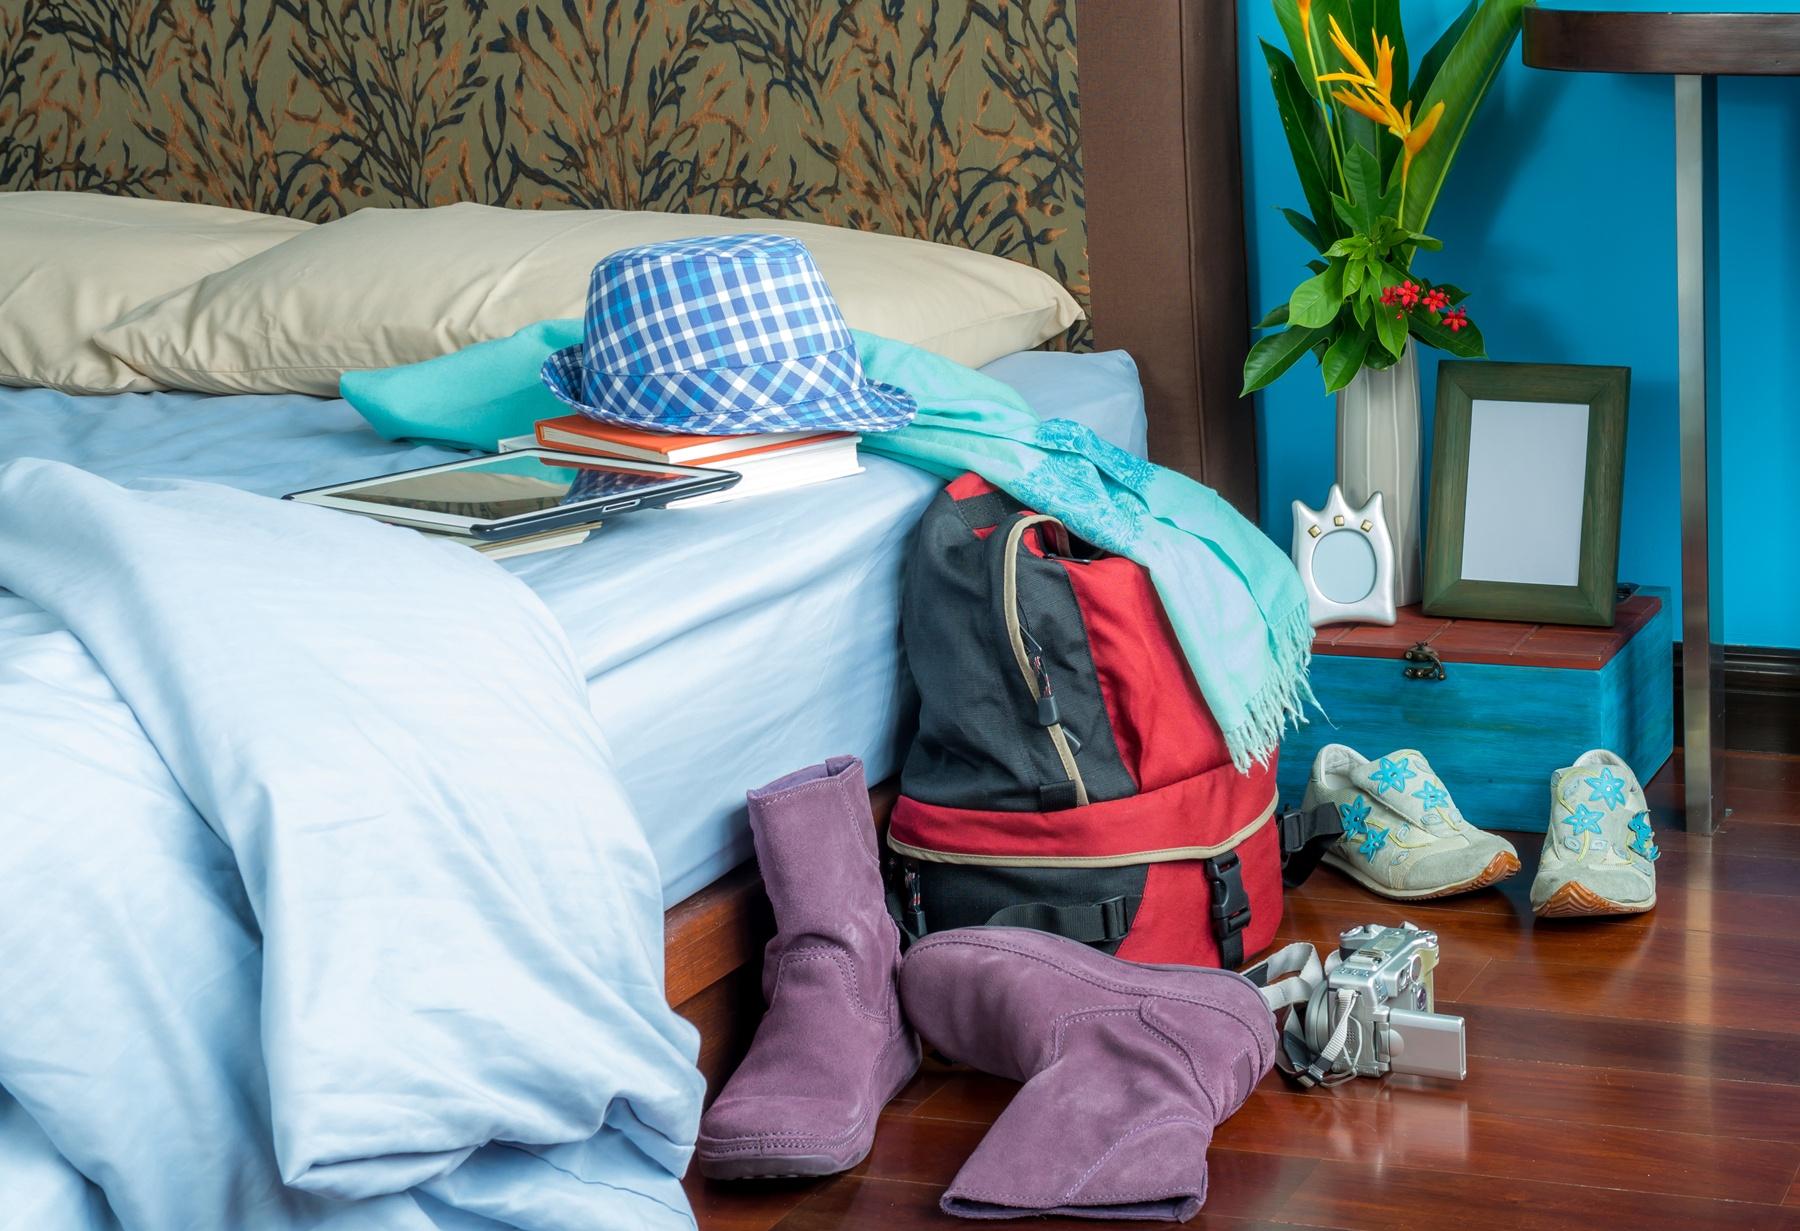 logement pas cher les solutions les plus adapt es ready blog. Black Bedroom Furniture Sets. Home Design Ideas